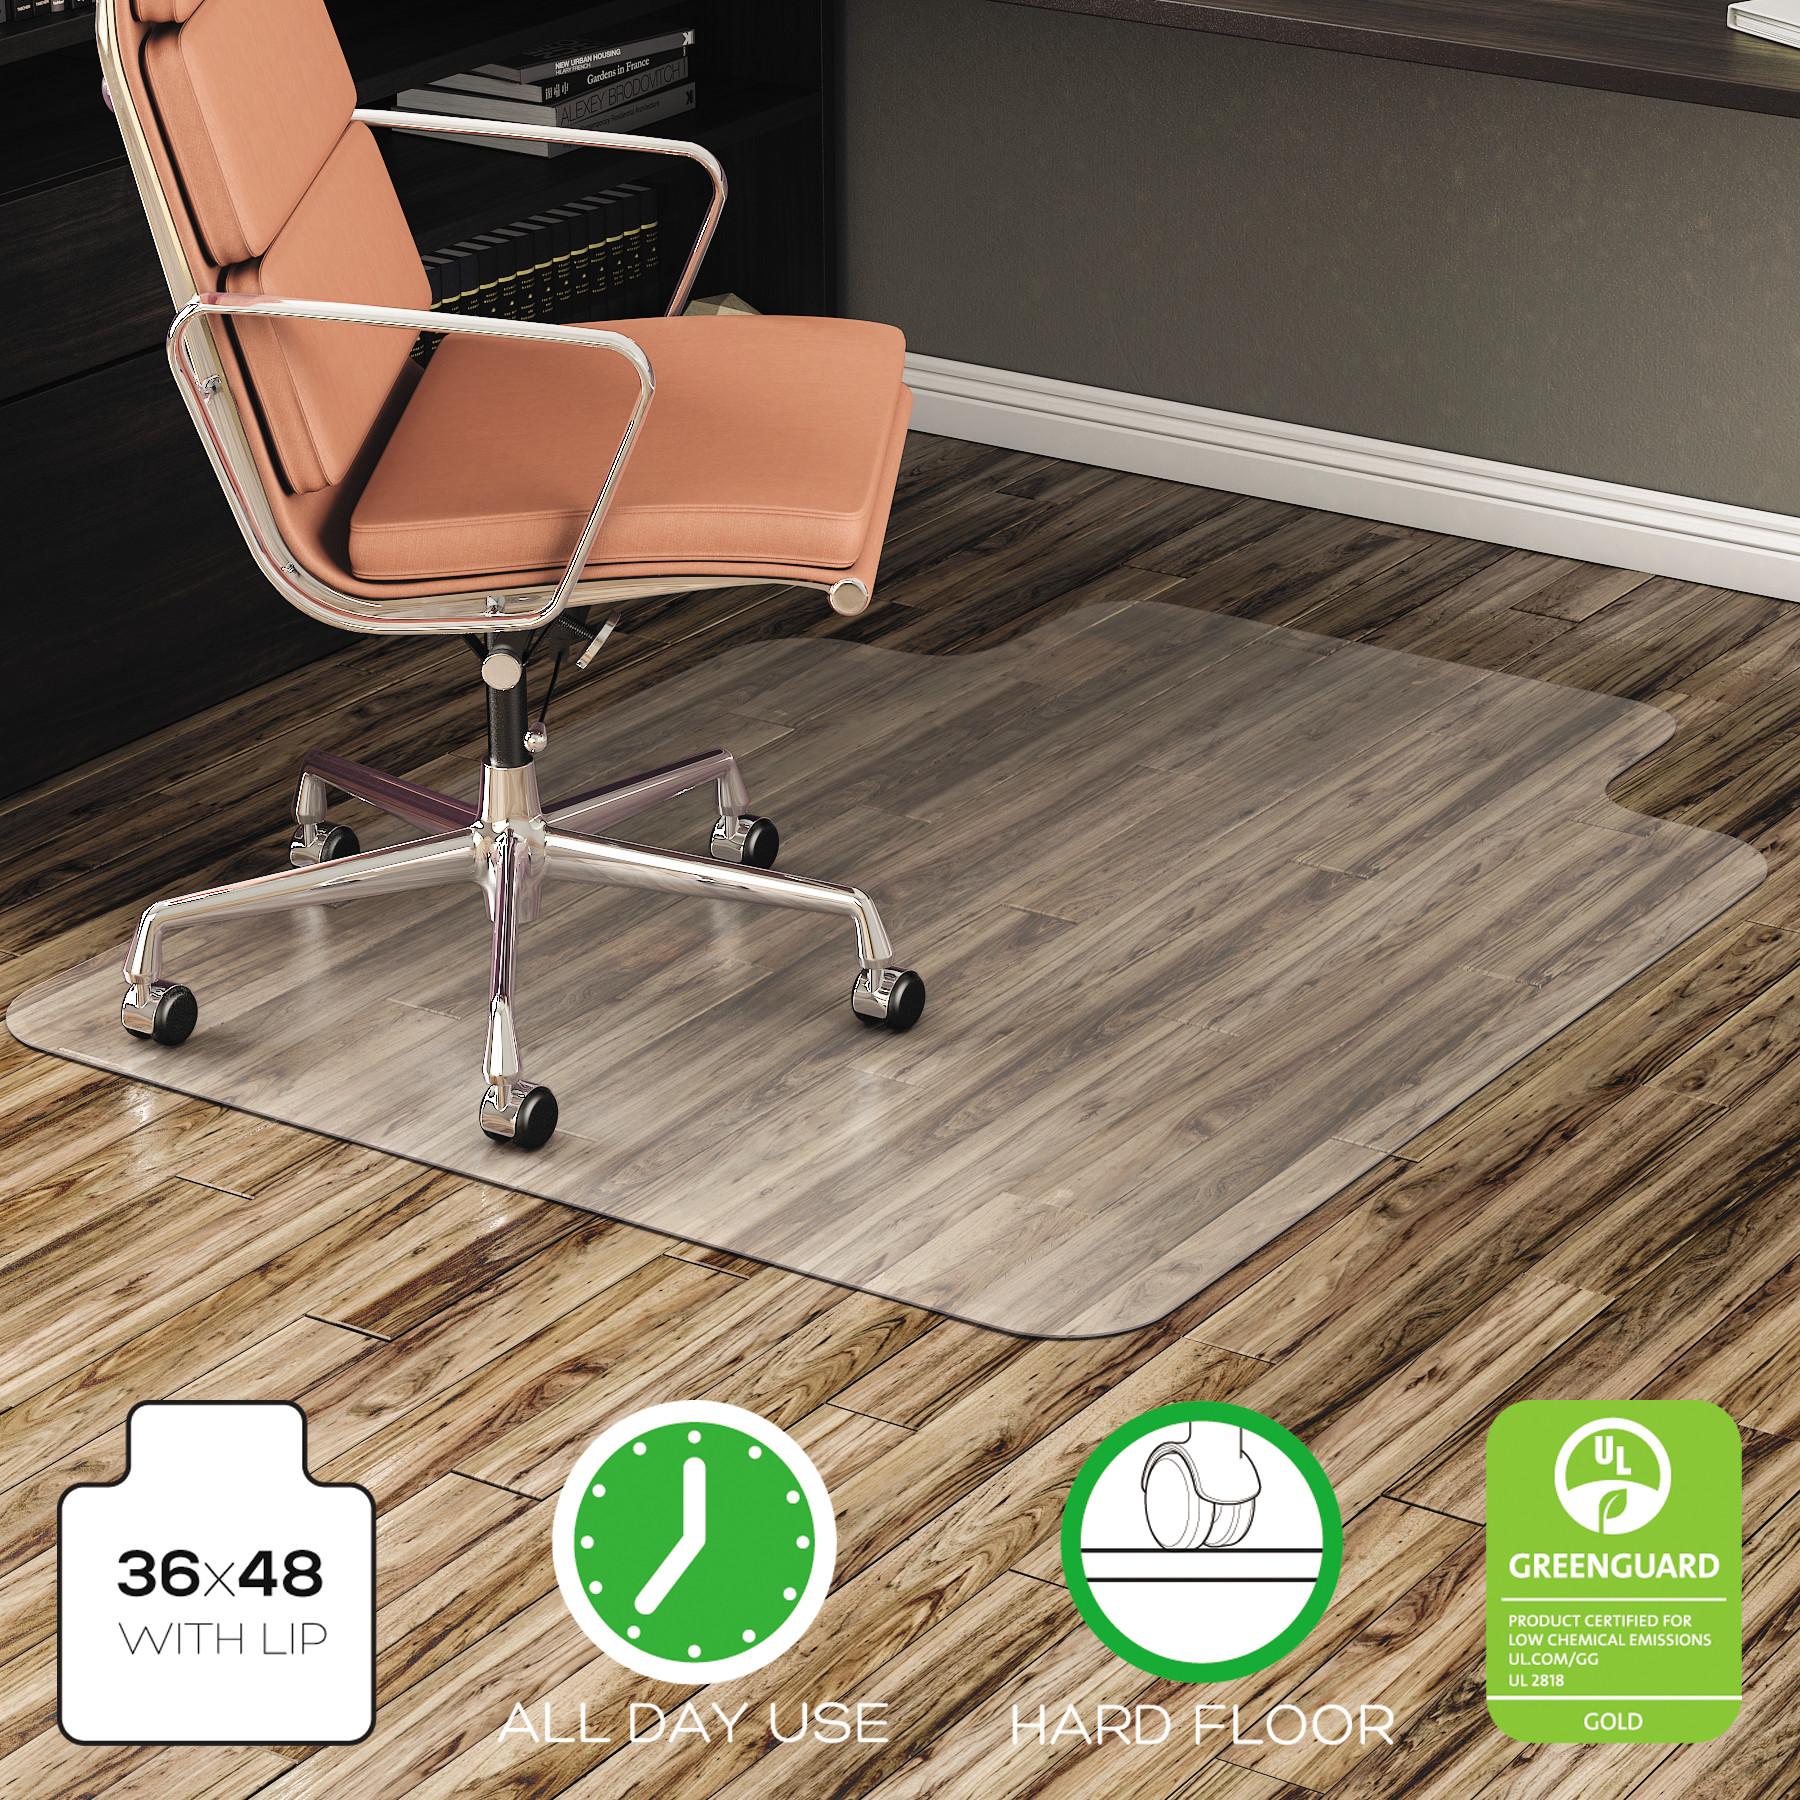 Deflecto EconoMat 36 x 48 Chair Mat for Hard Floor, Rectangular with Lip